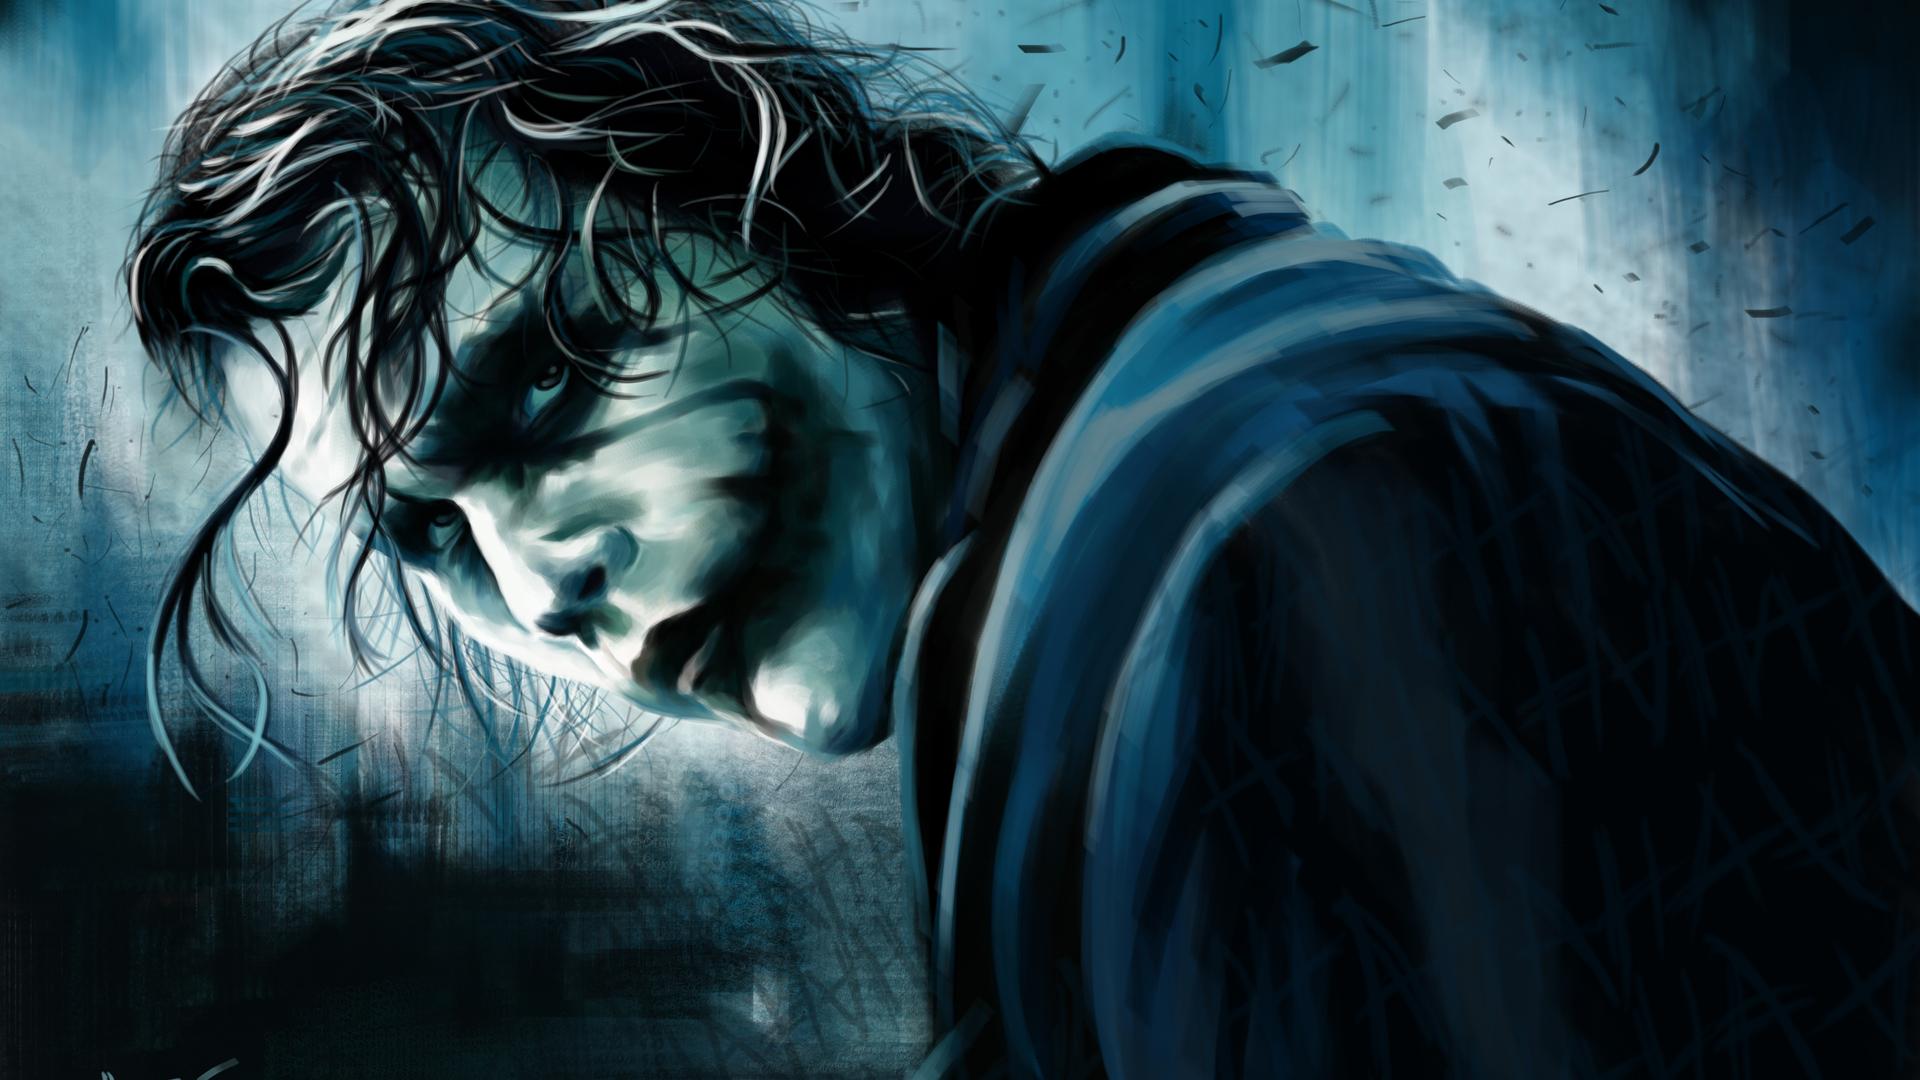 1920x1080 Christopher Nolan Joker Art Laptop Full HD 1080P ...